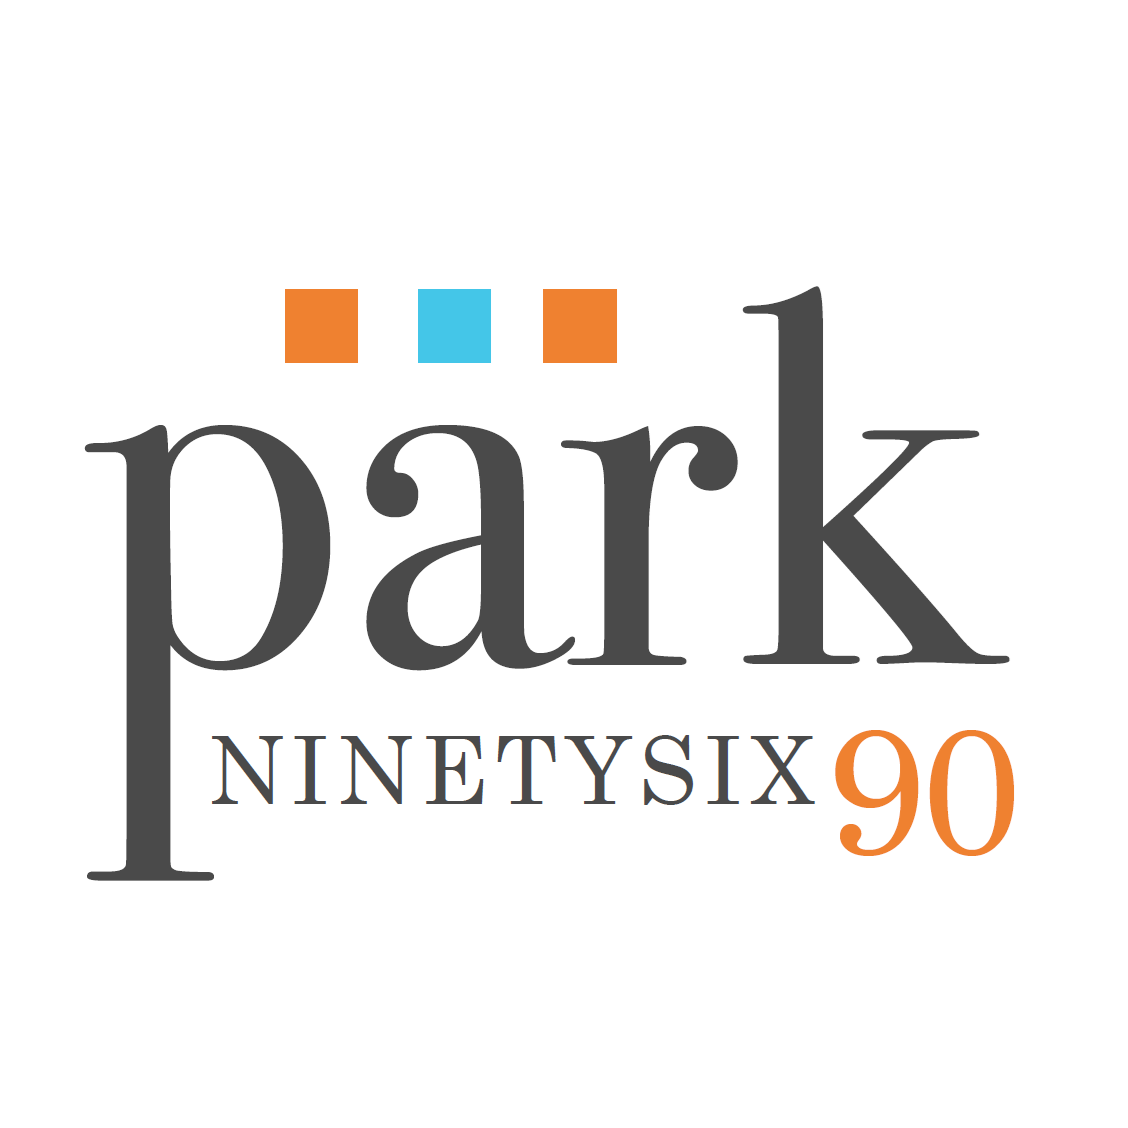 Park Ninety Six 90 (Formerly Jackson Branch)